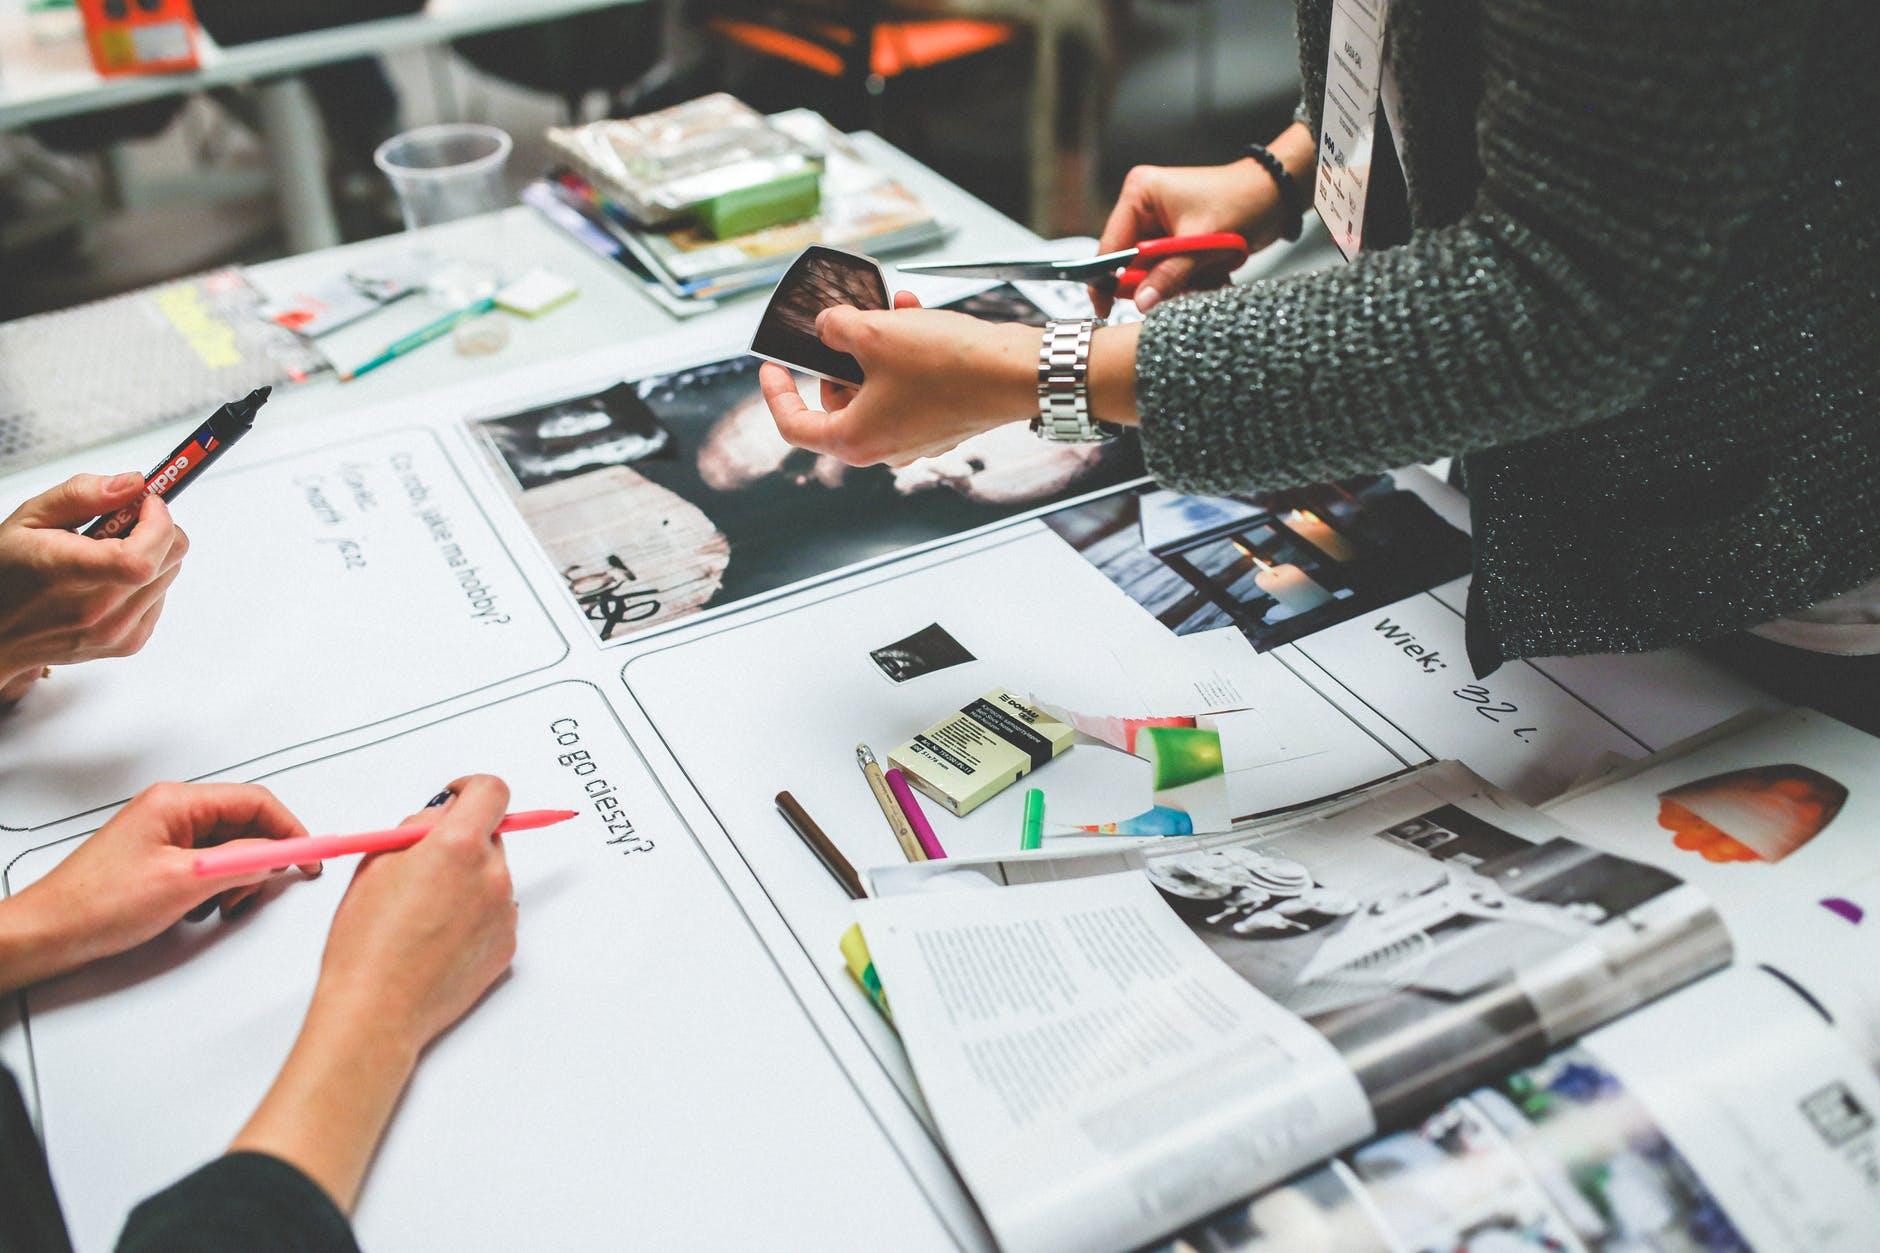 job responsibilities of a multimedia designer